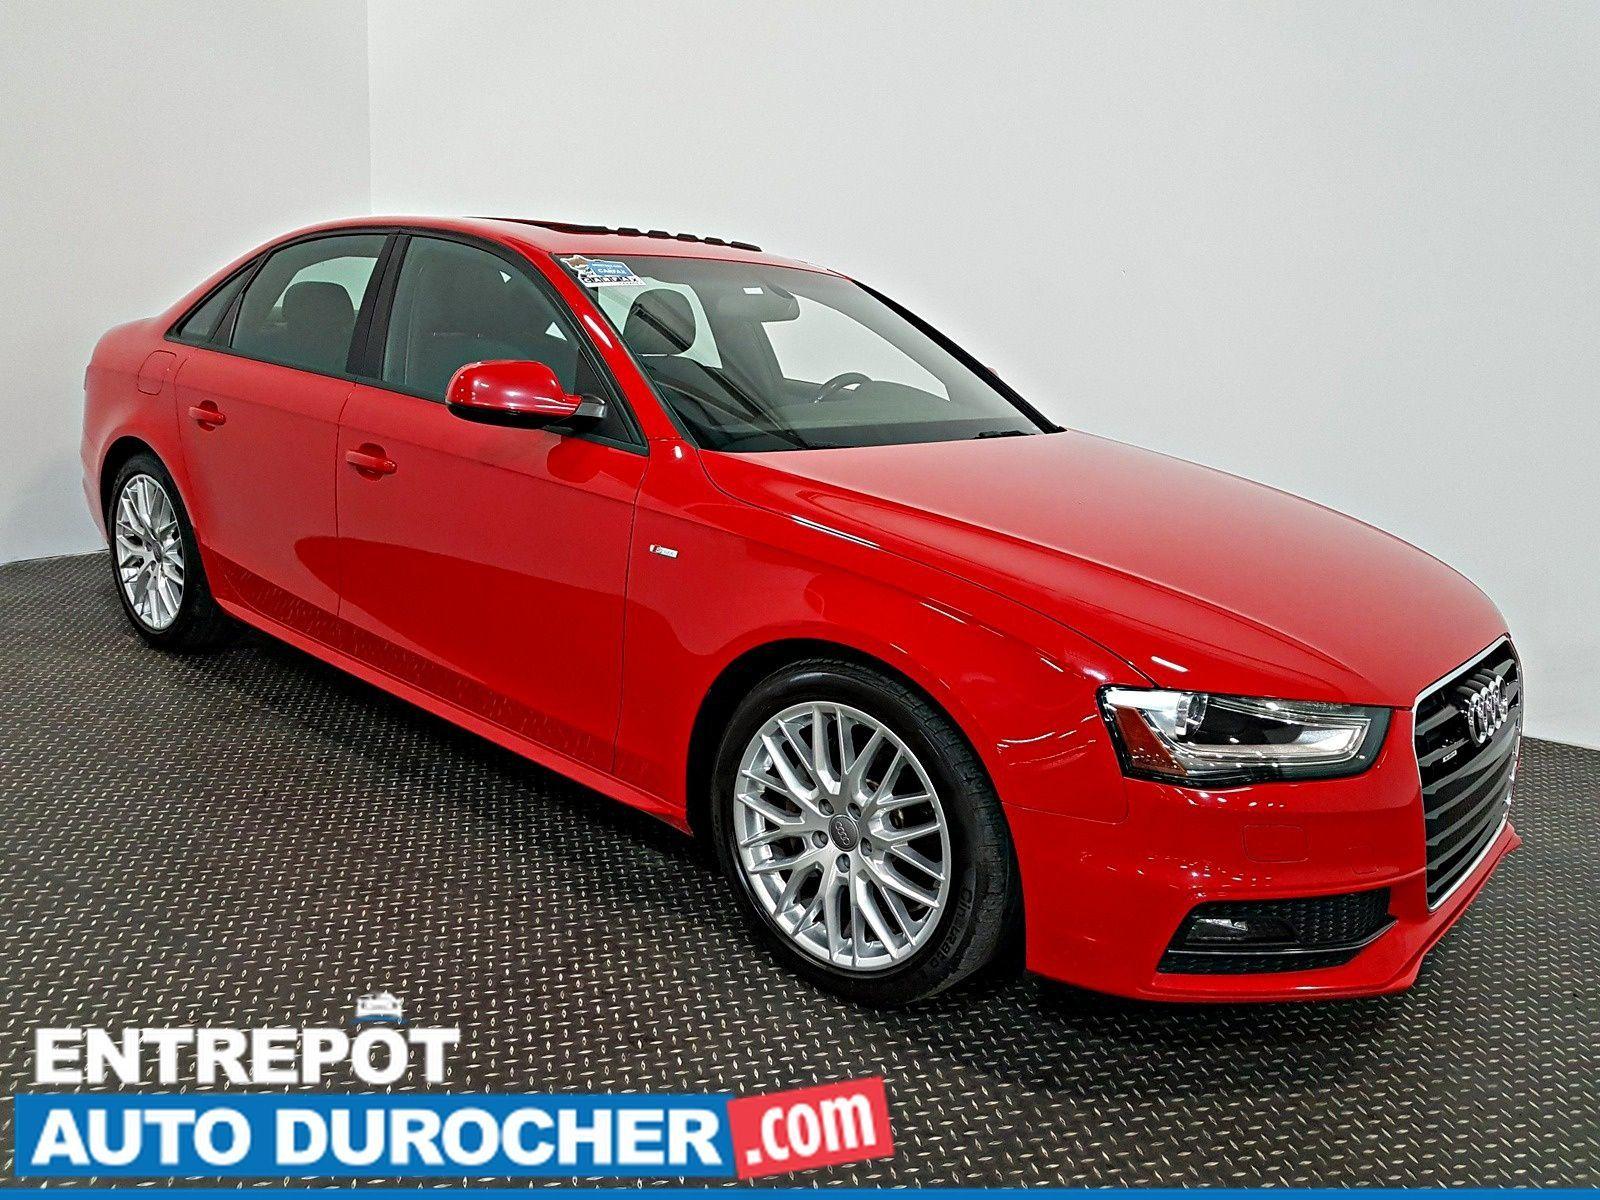 2015 Audi A4 Komfort plus AWD TOIT OUVRANT A/C - Cuir - Sièges Chauffants